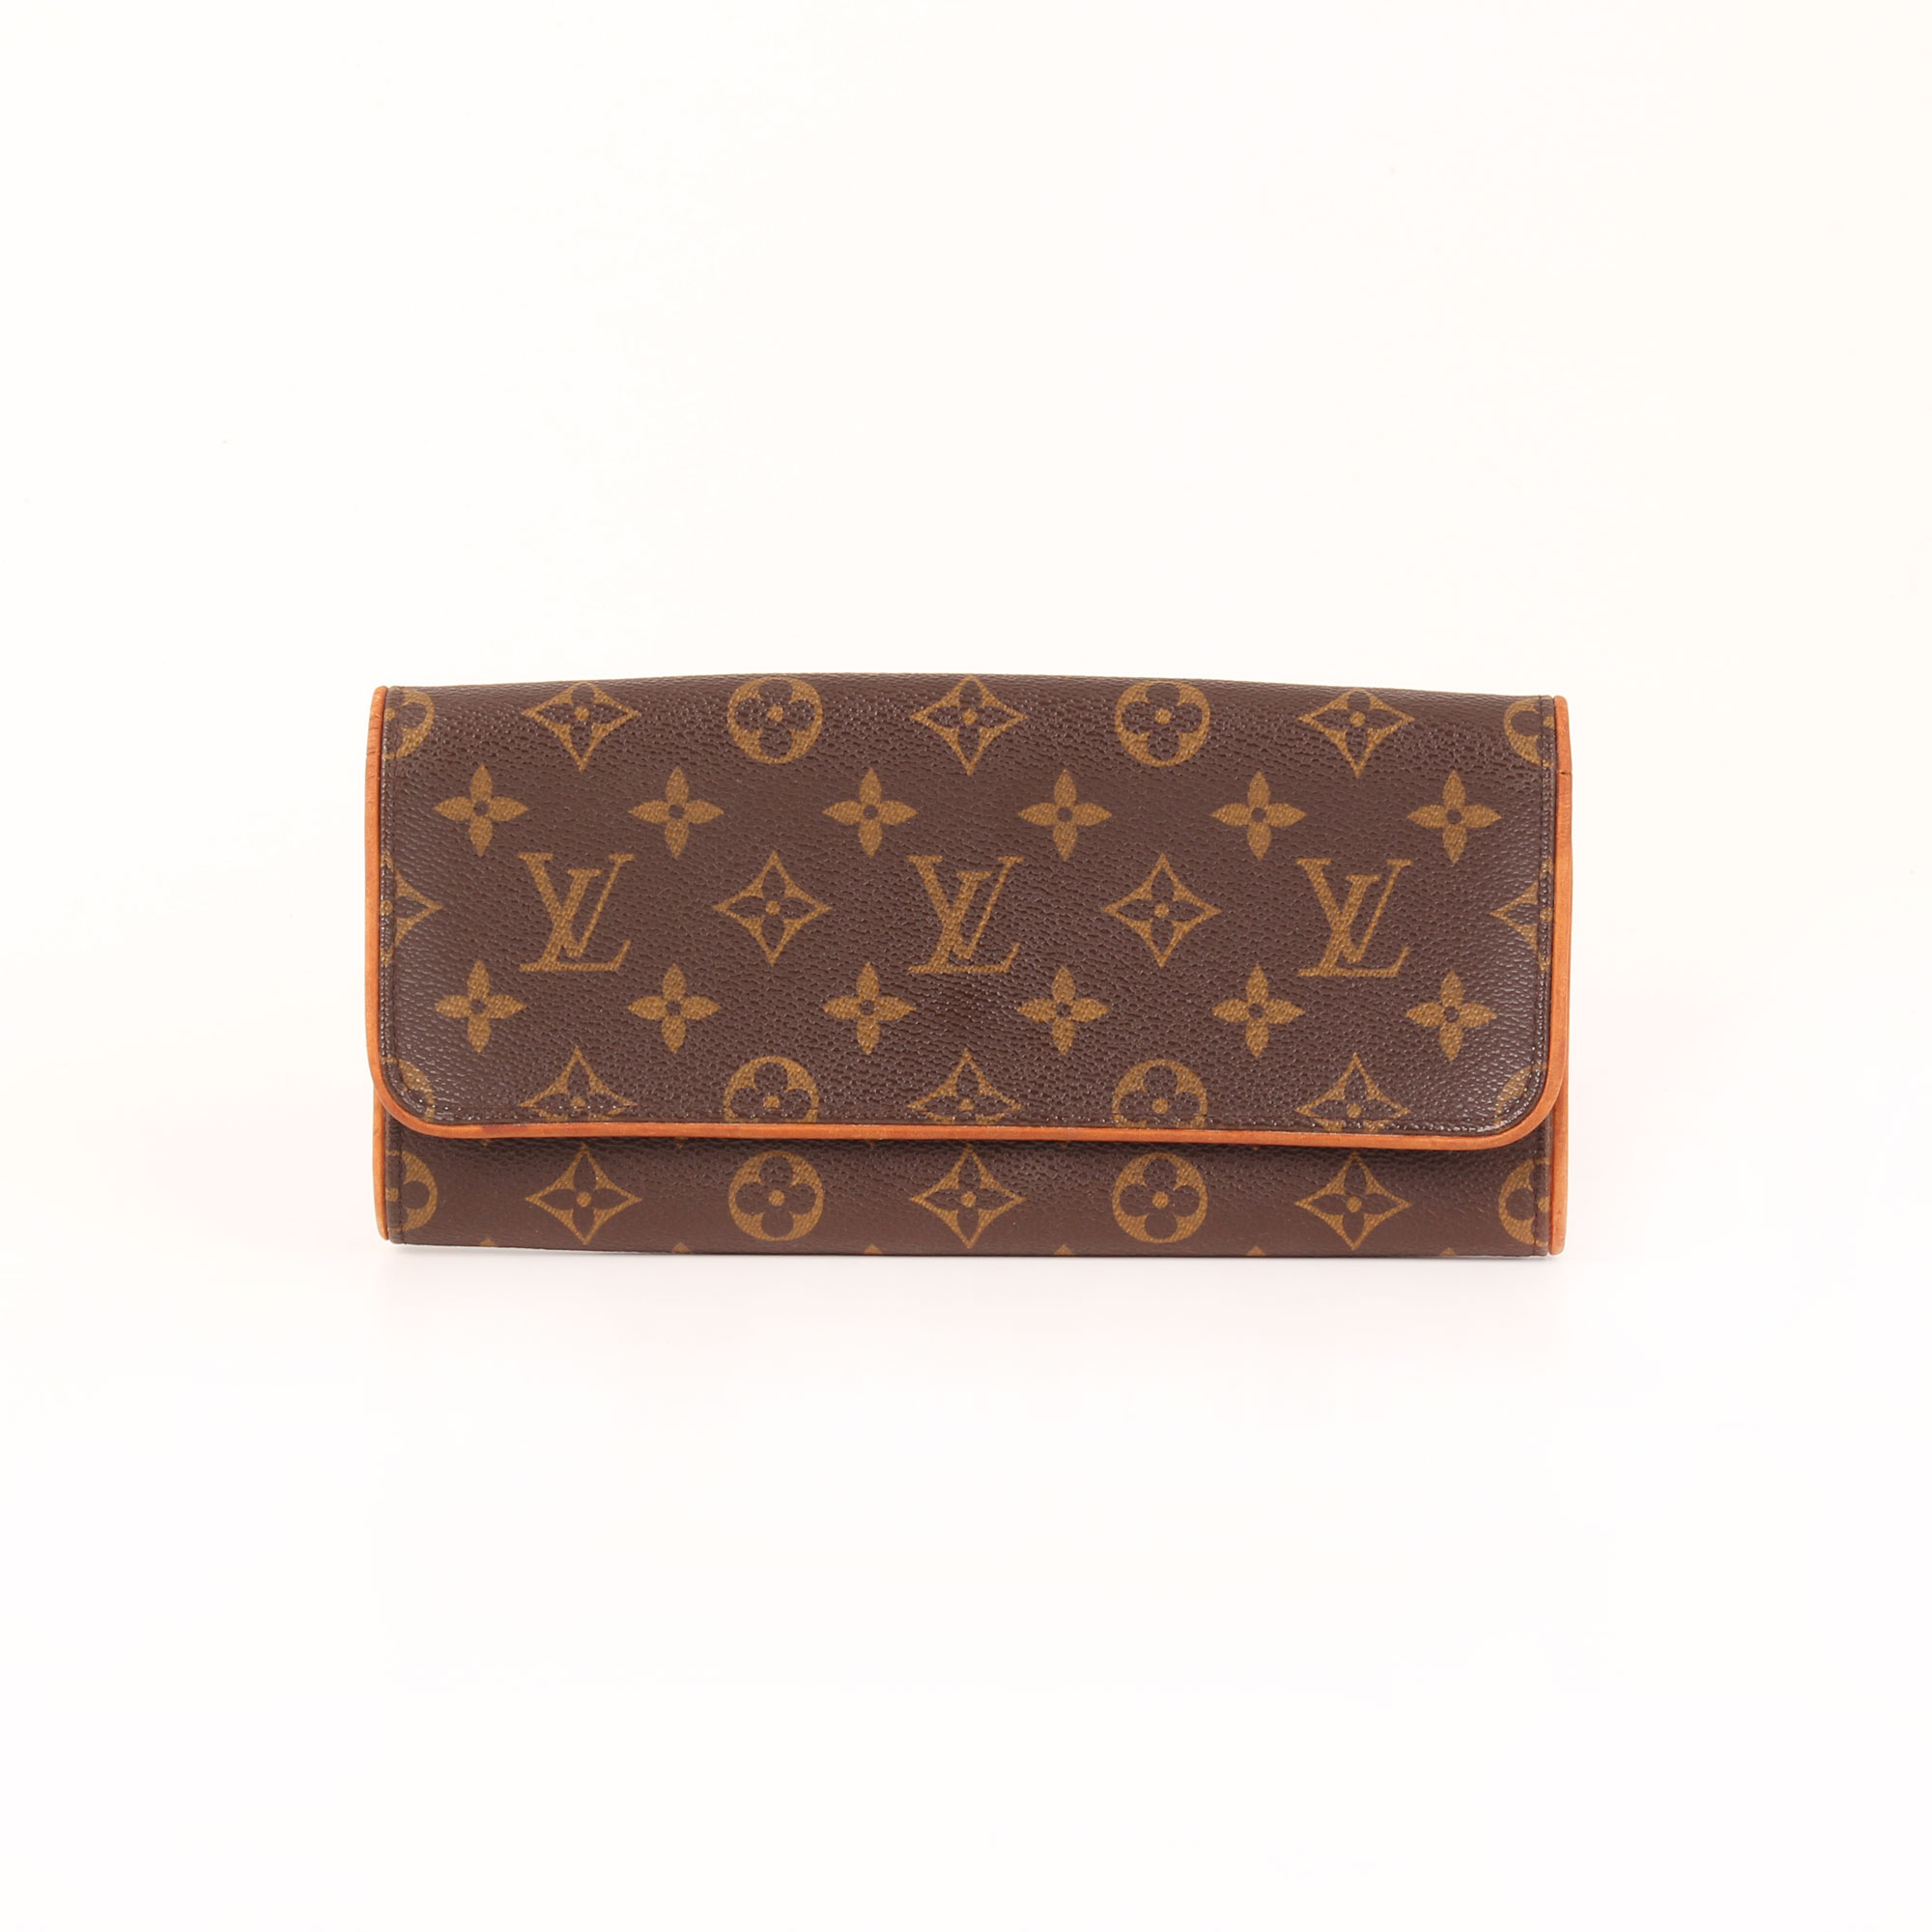 Louis Vuitton Pochette Twin GM Monogram Vintage I CBL Bags 9ab33063bf3be